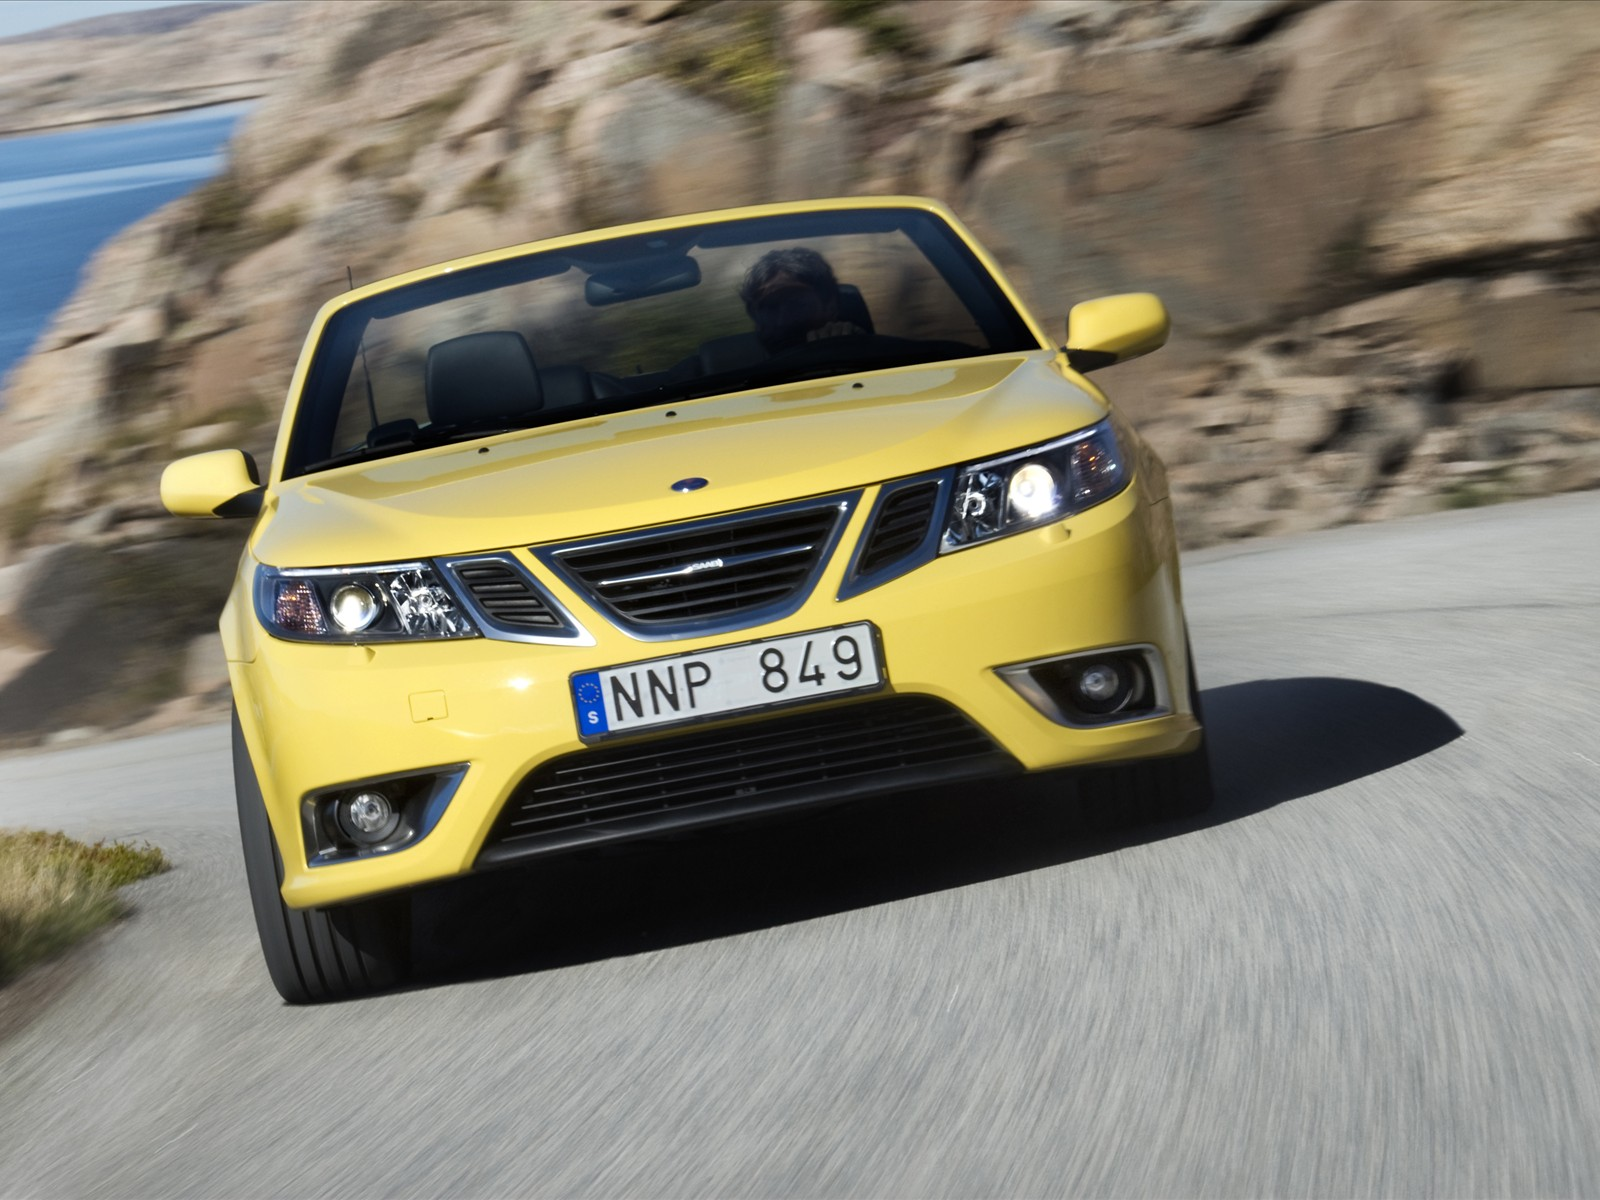 Tuning Cars Wallpapers Hd 2008 Saab 9 3 Convertible Yellow Edition News And Information